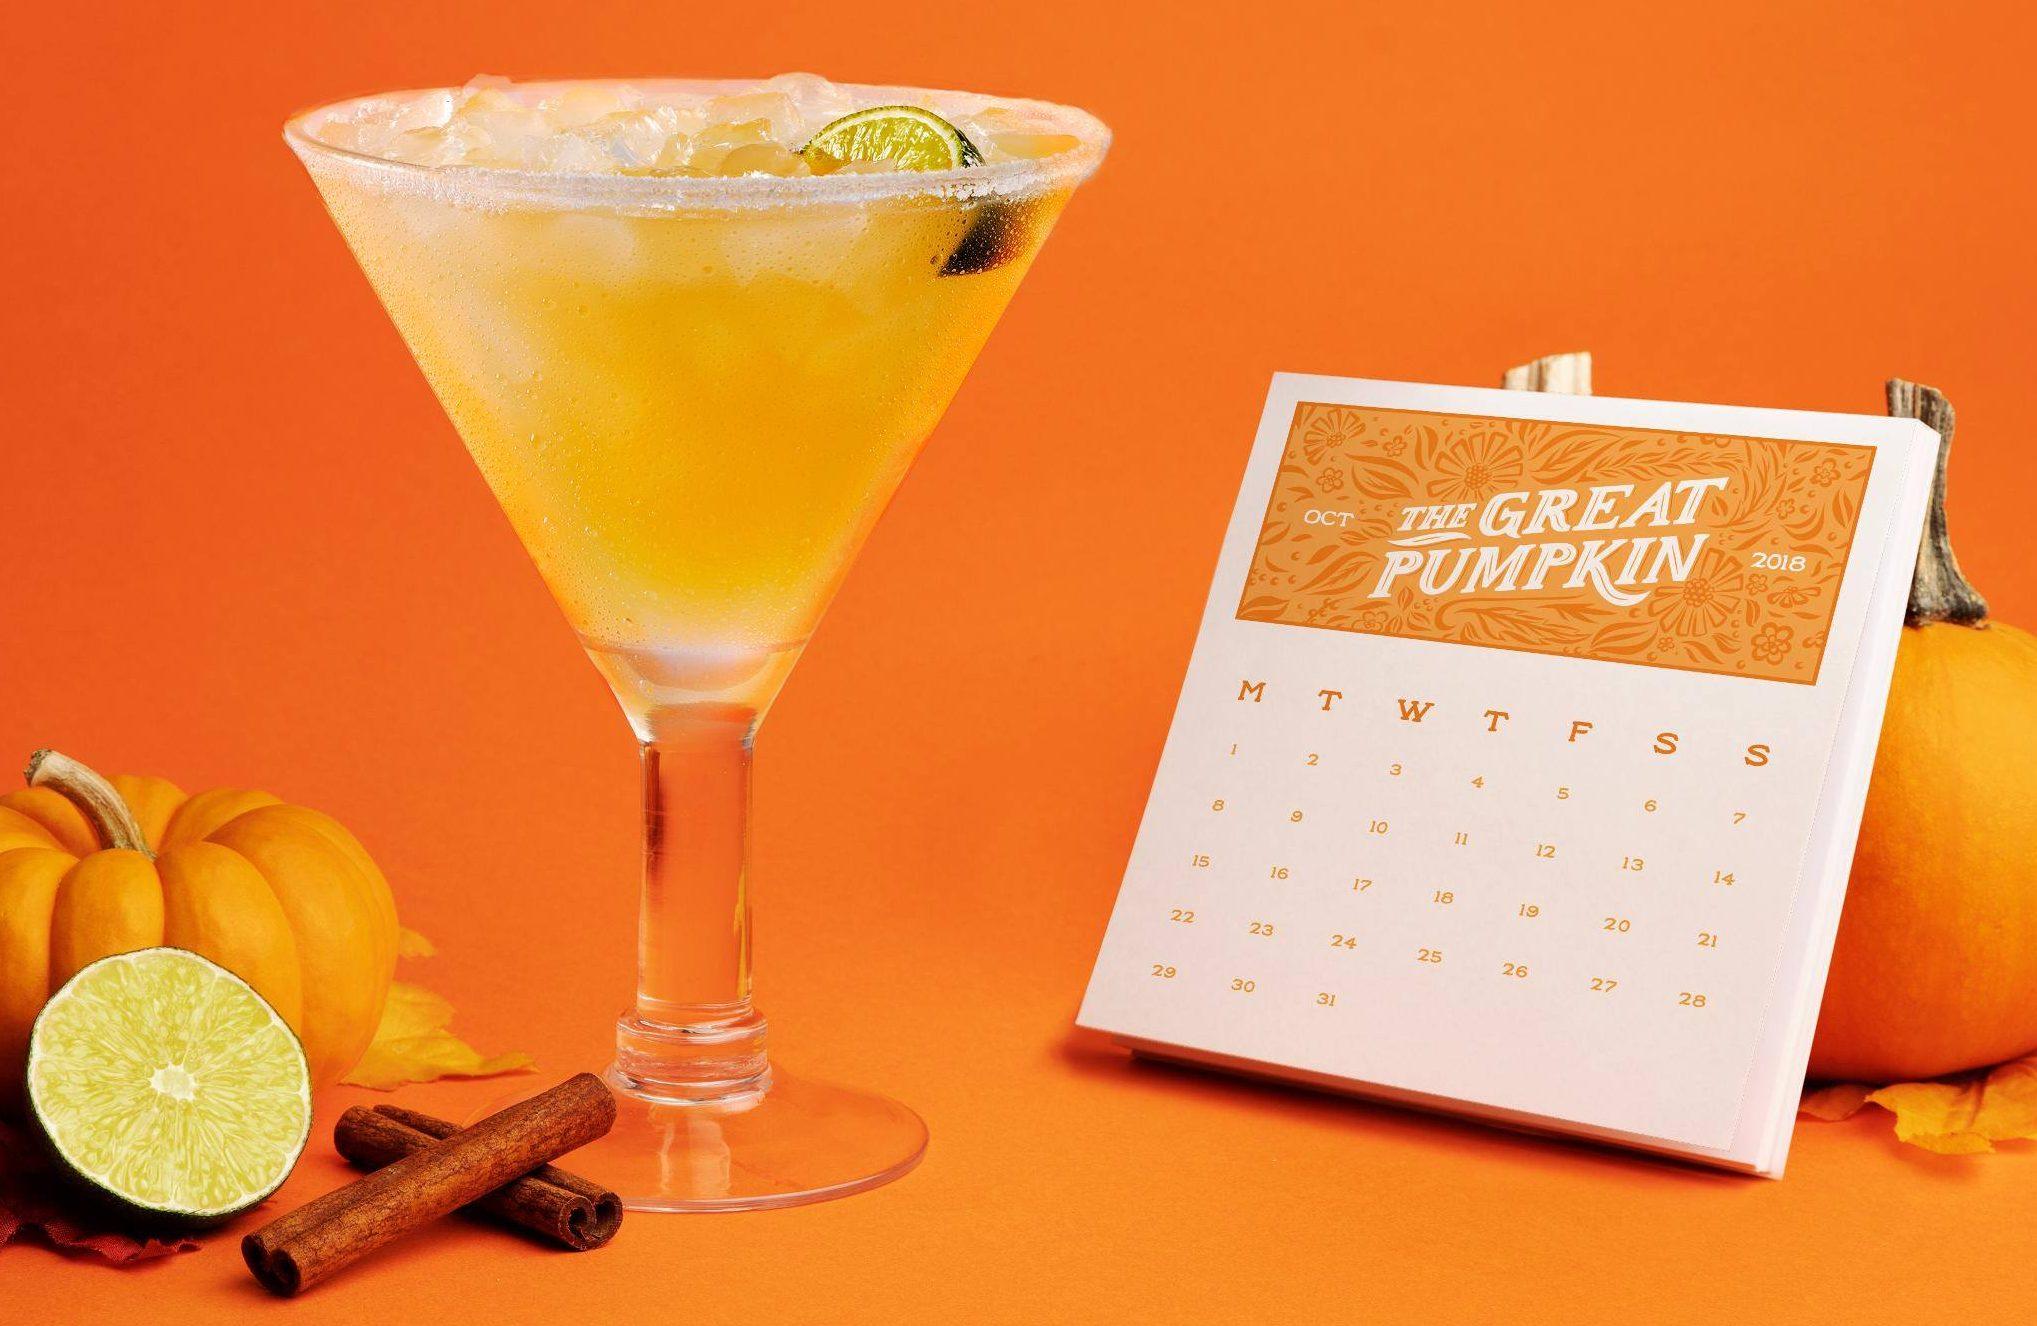 Halloween freebies and deals – Chili's Pumpkin Margarita